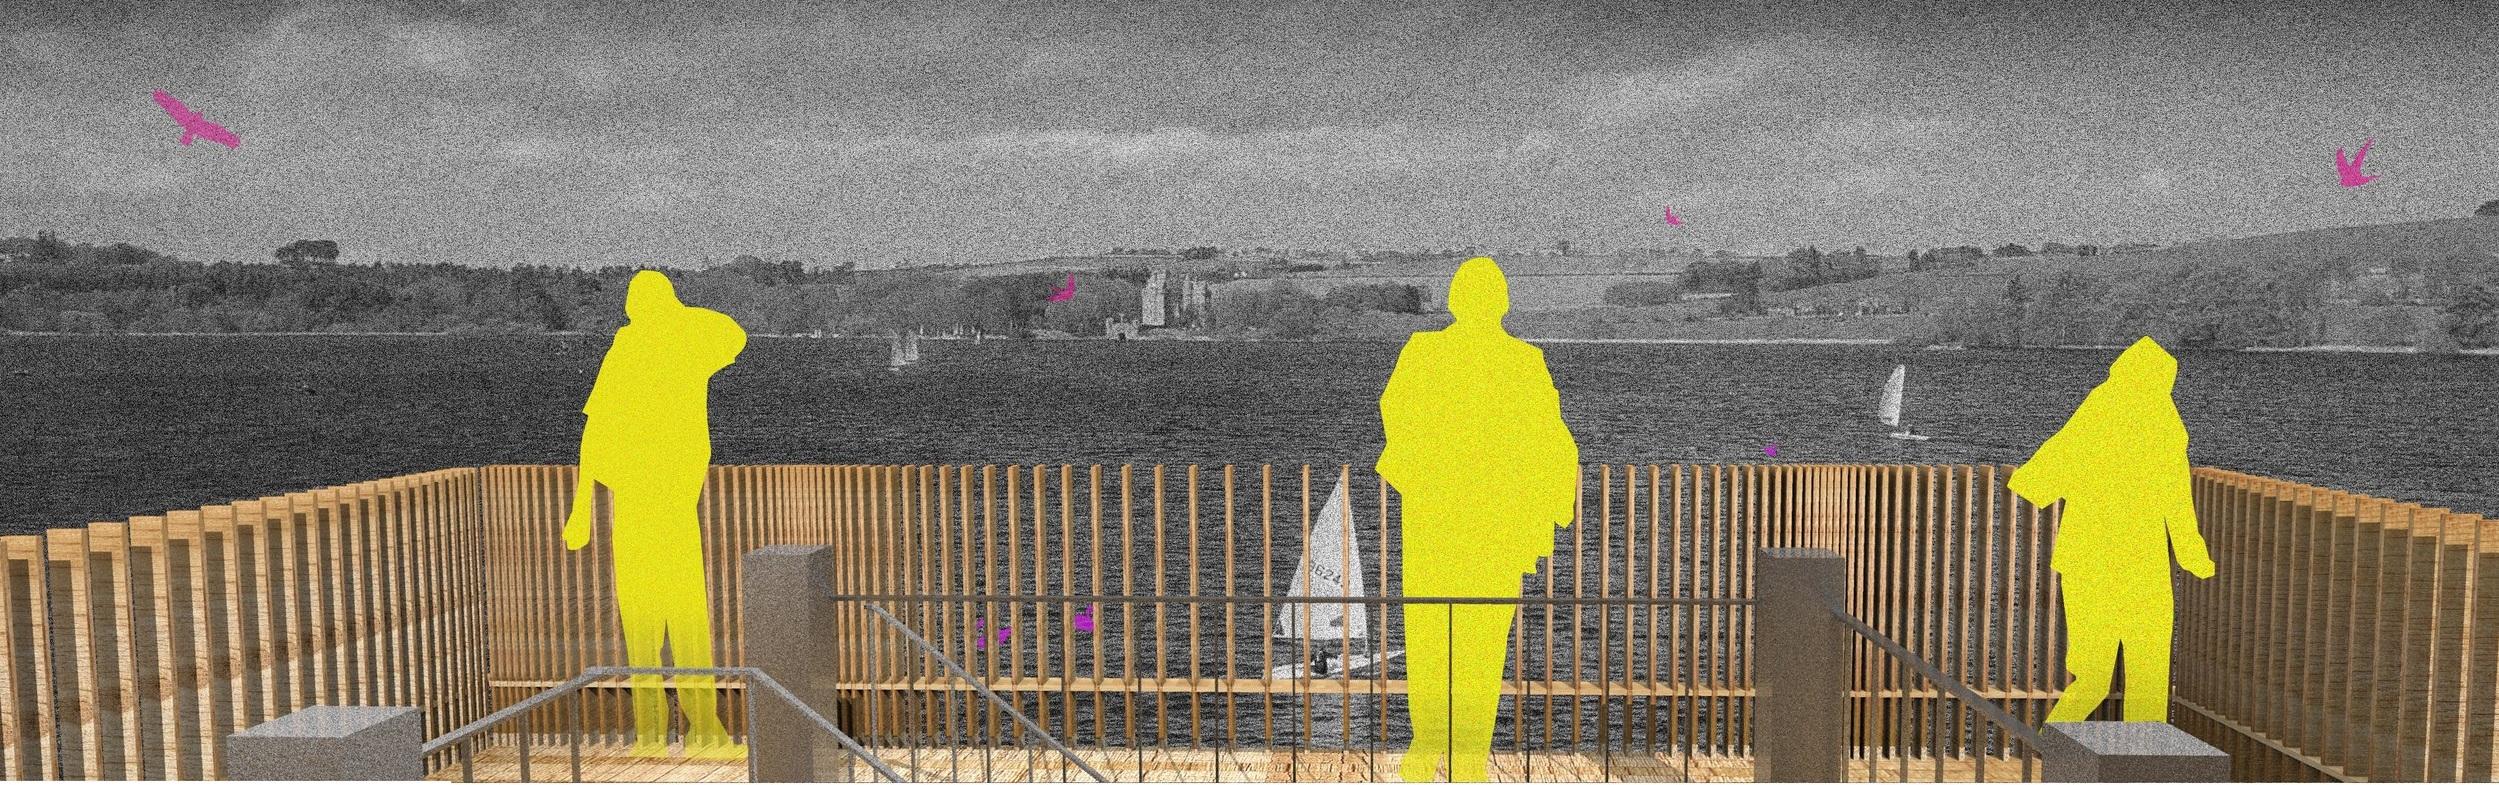 Felix+Wilson+-+Felix-Wilson-TheArchiologist-Tower_III-2-View-From-Top-Platform.jpg